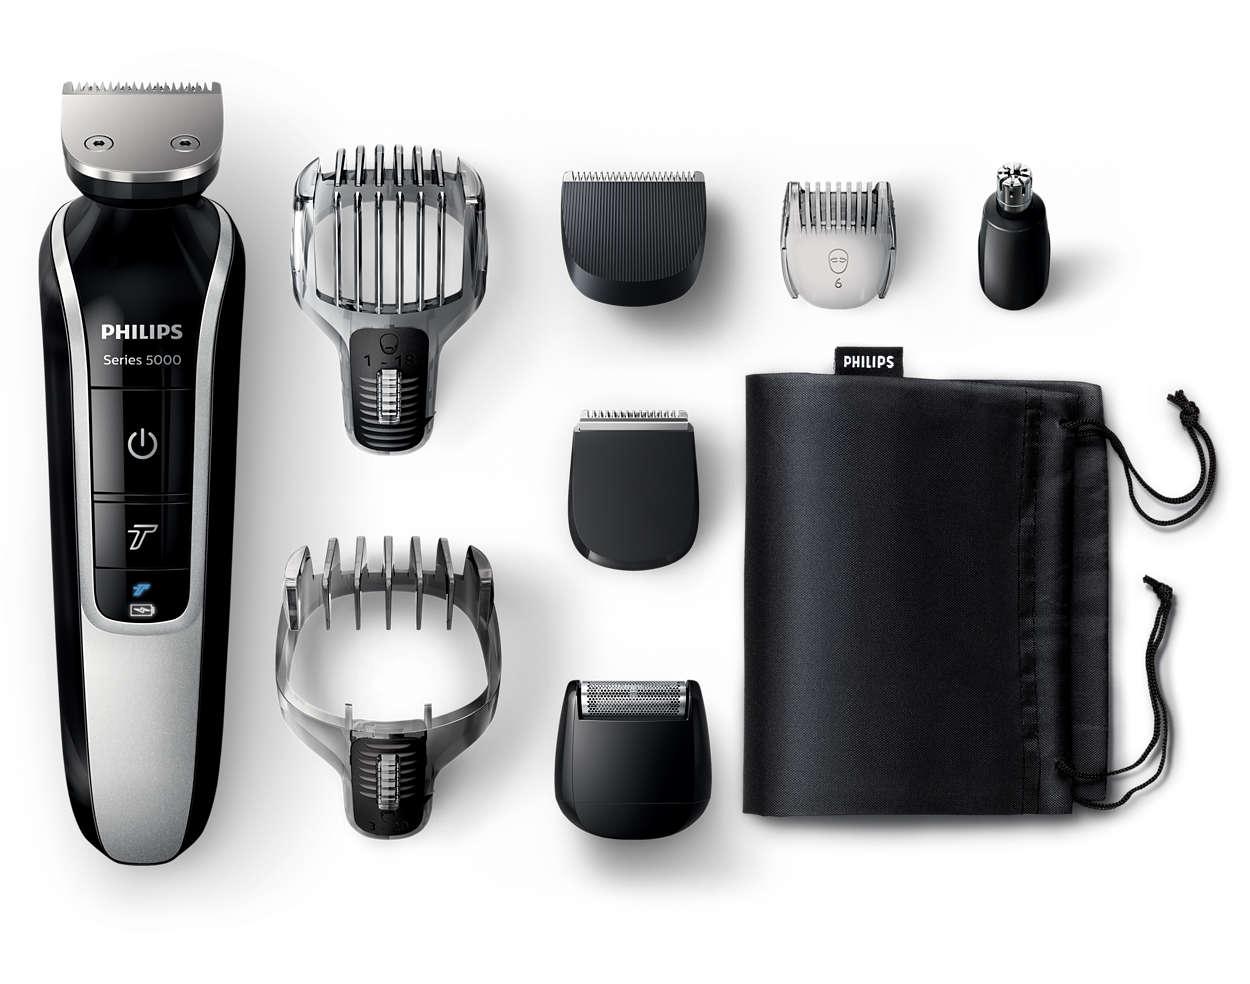 All-in-one-trimmeri parran ja hiusten viimeistelyyn